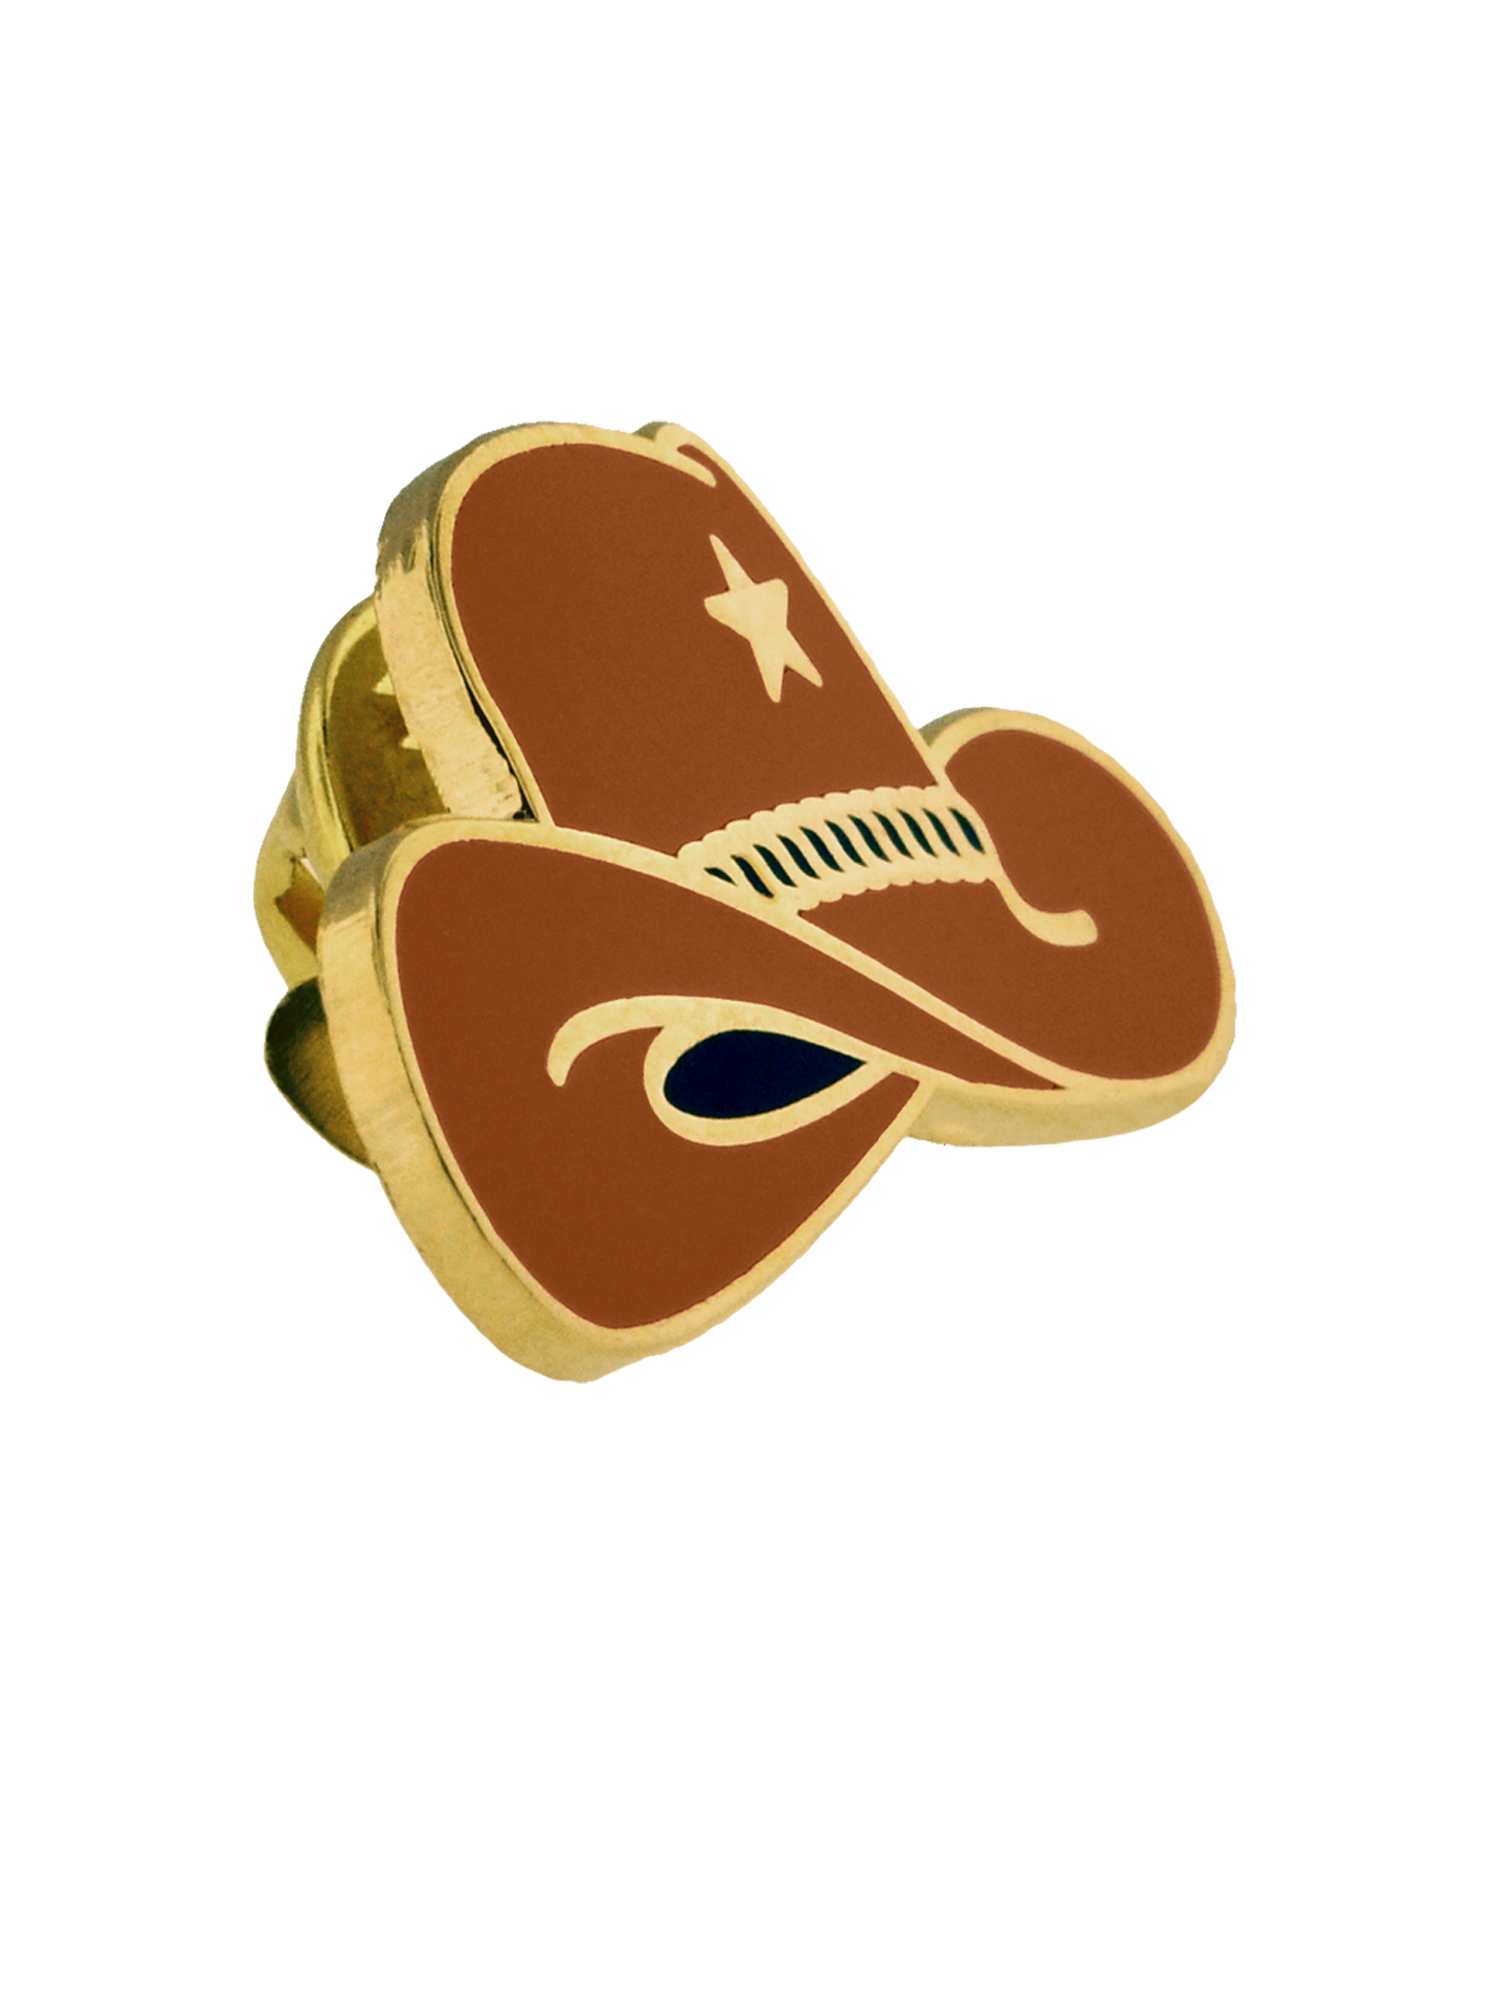 WHOLESALE NEW RODEO COWBOY COWGIRL CAP HAT ORANGE